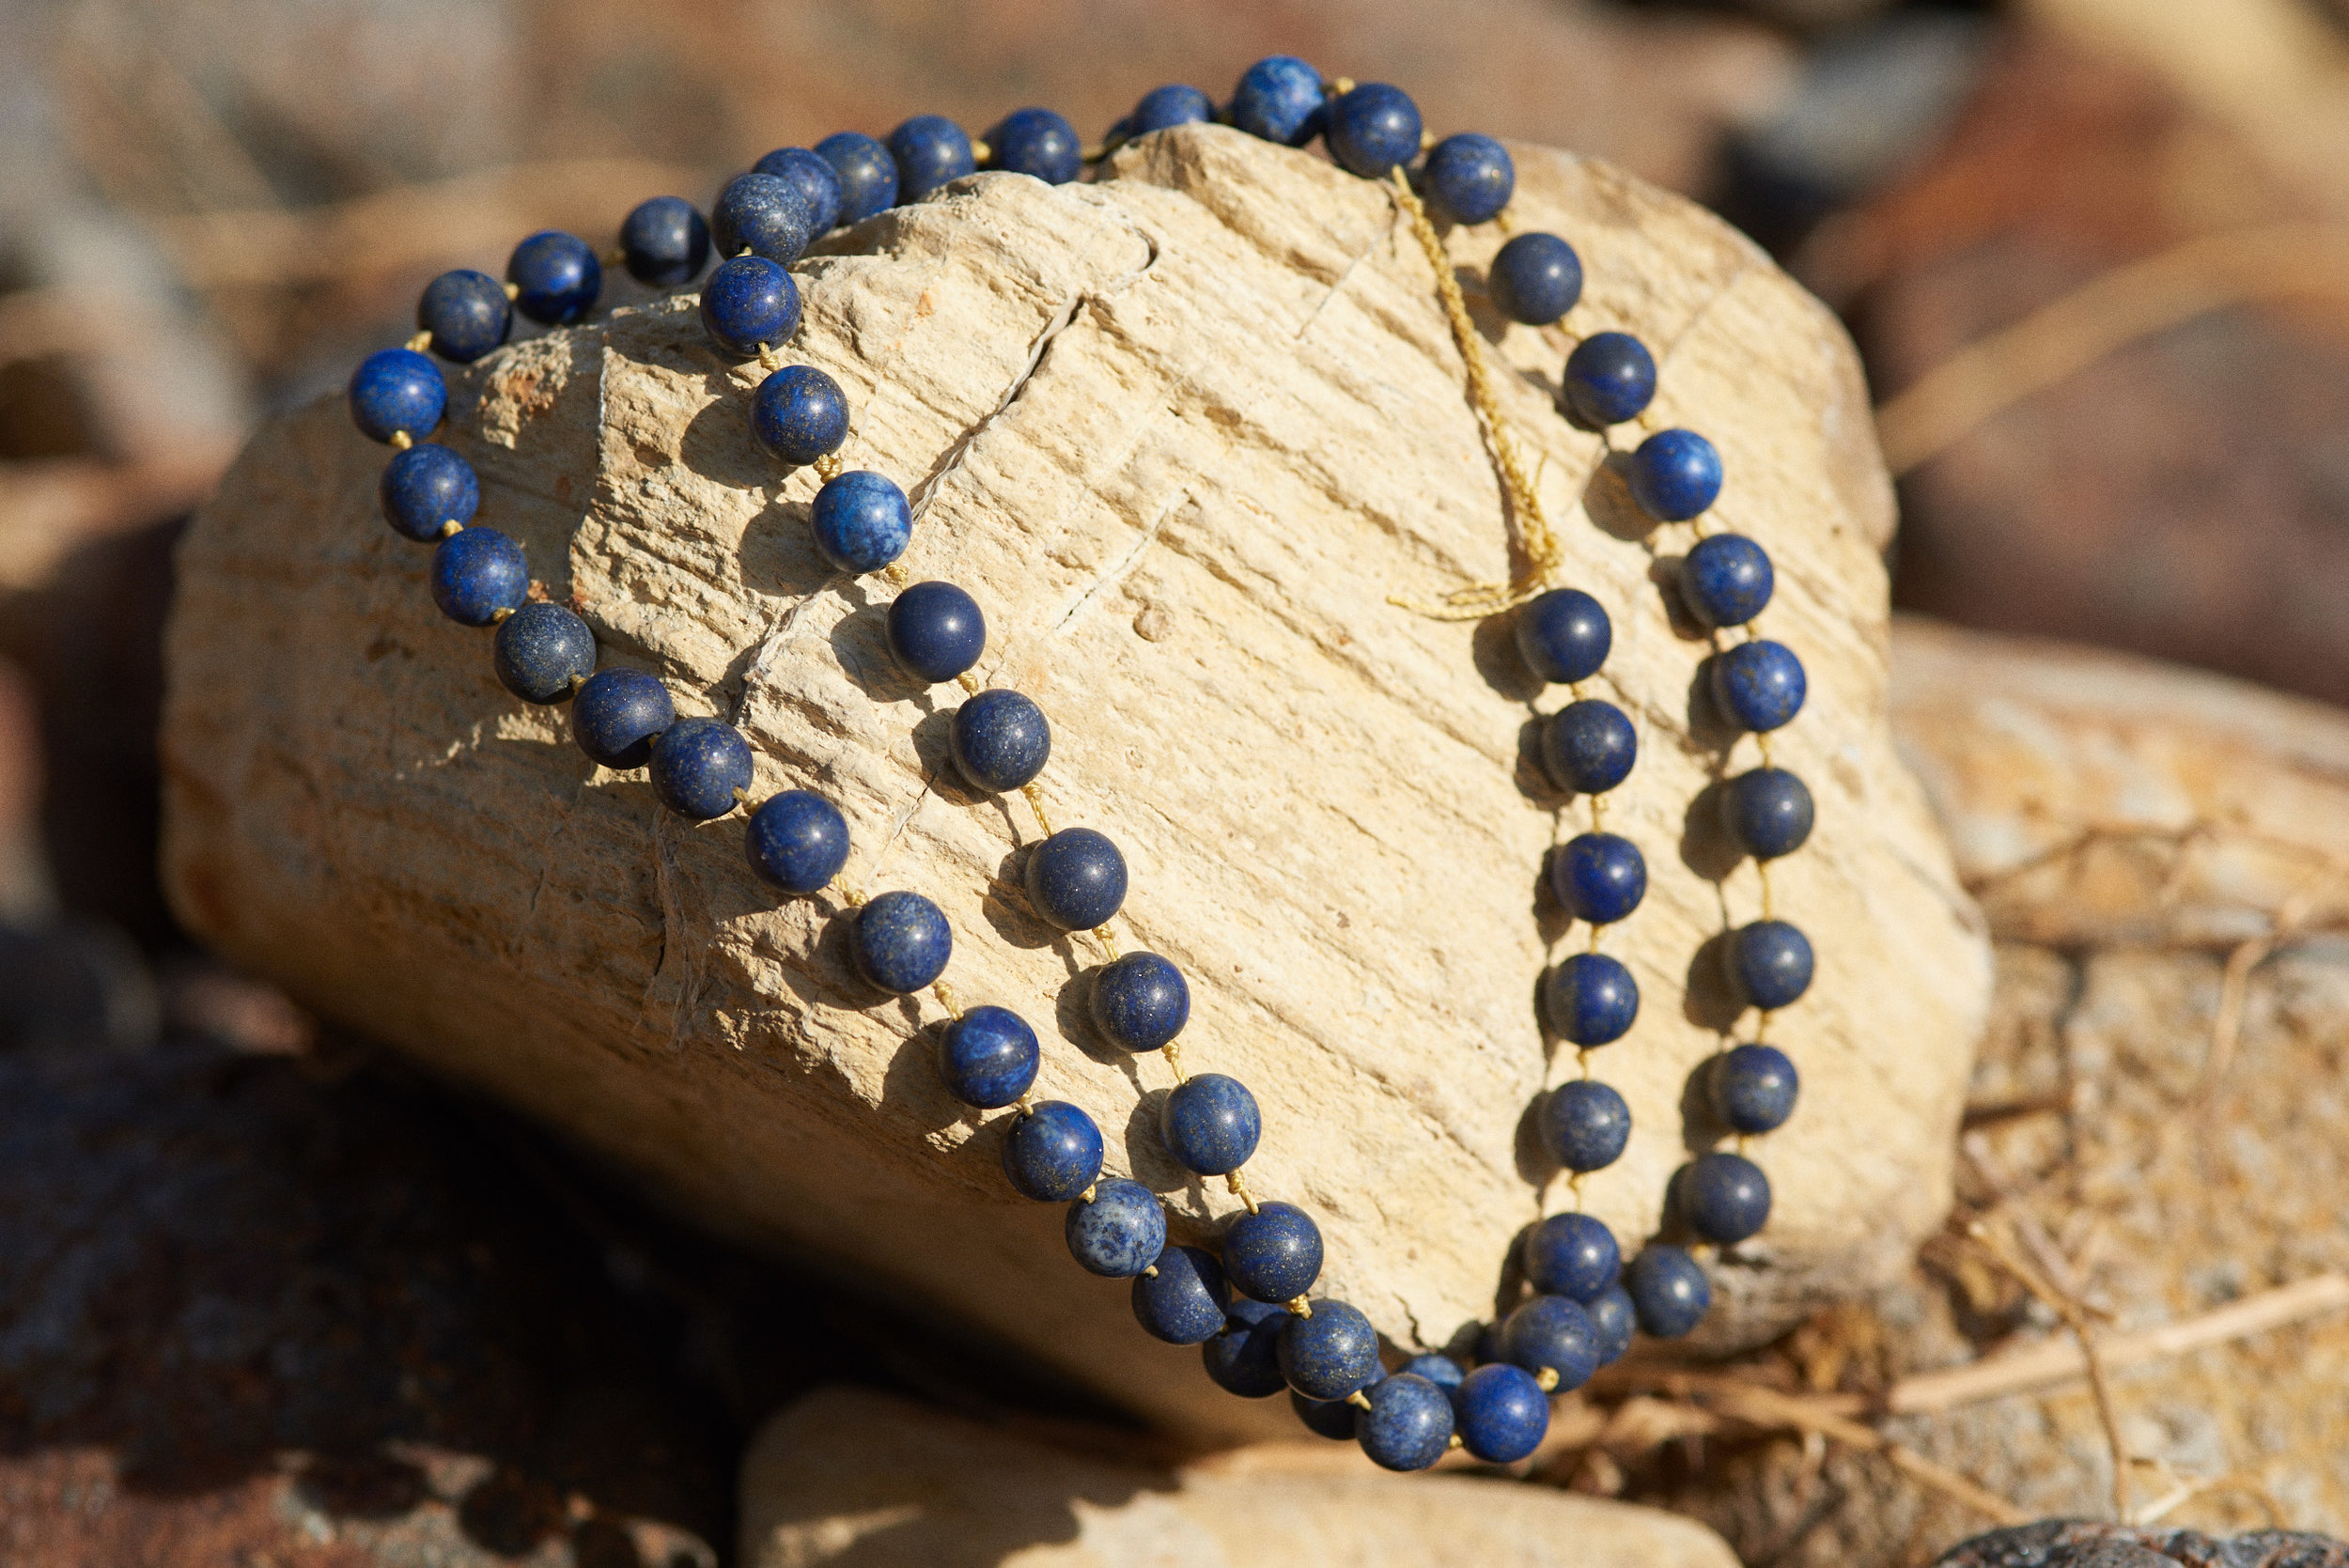 Hand beaded stone necklaces